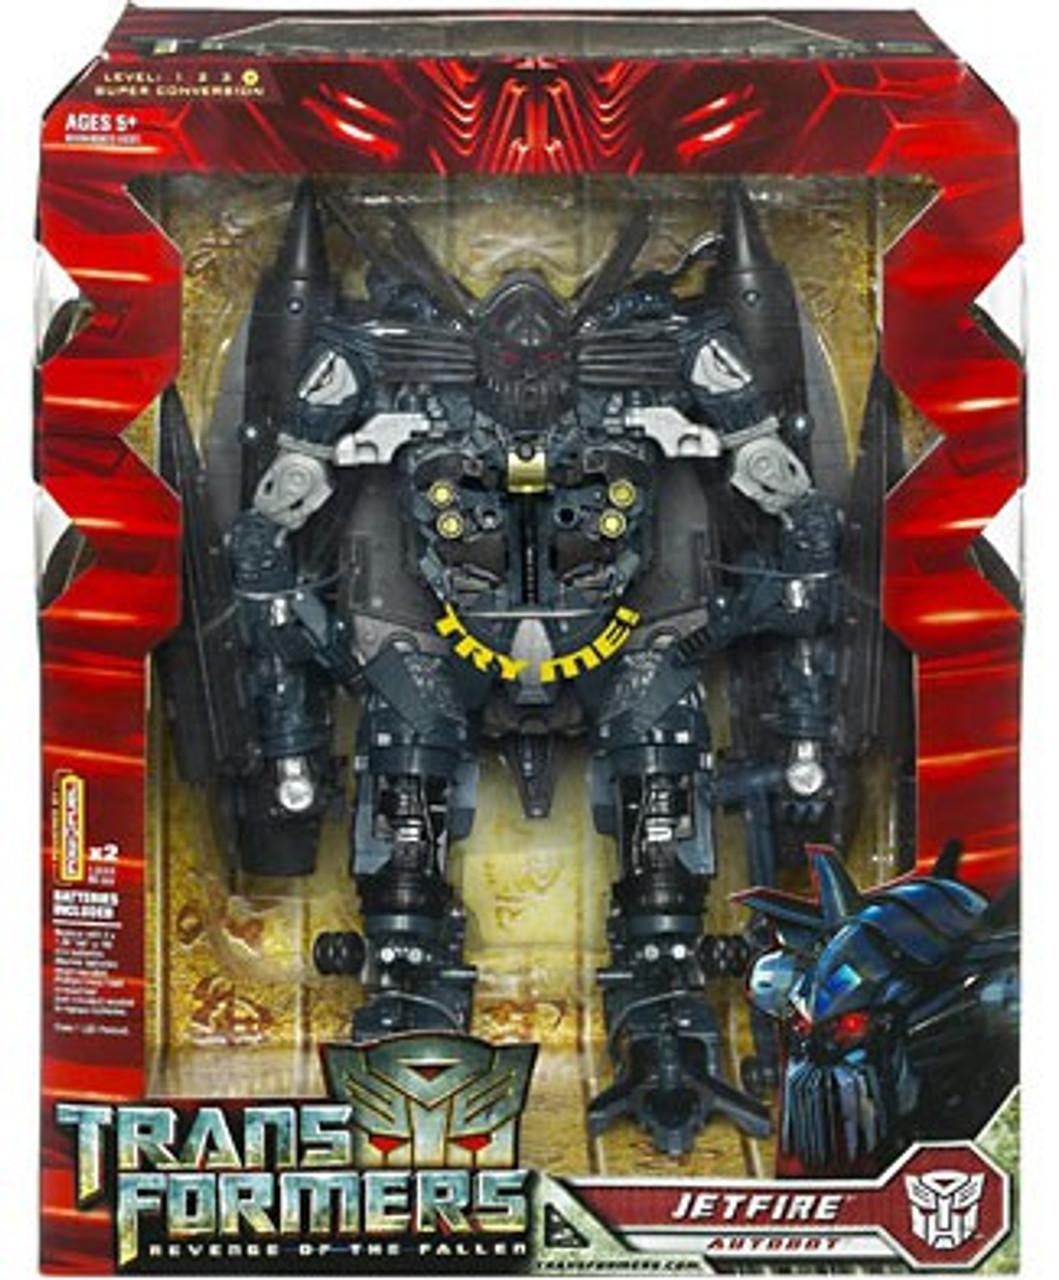 Transformers Revenge of the Fallen Jetfire Leader Action Figure [Electronic]